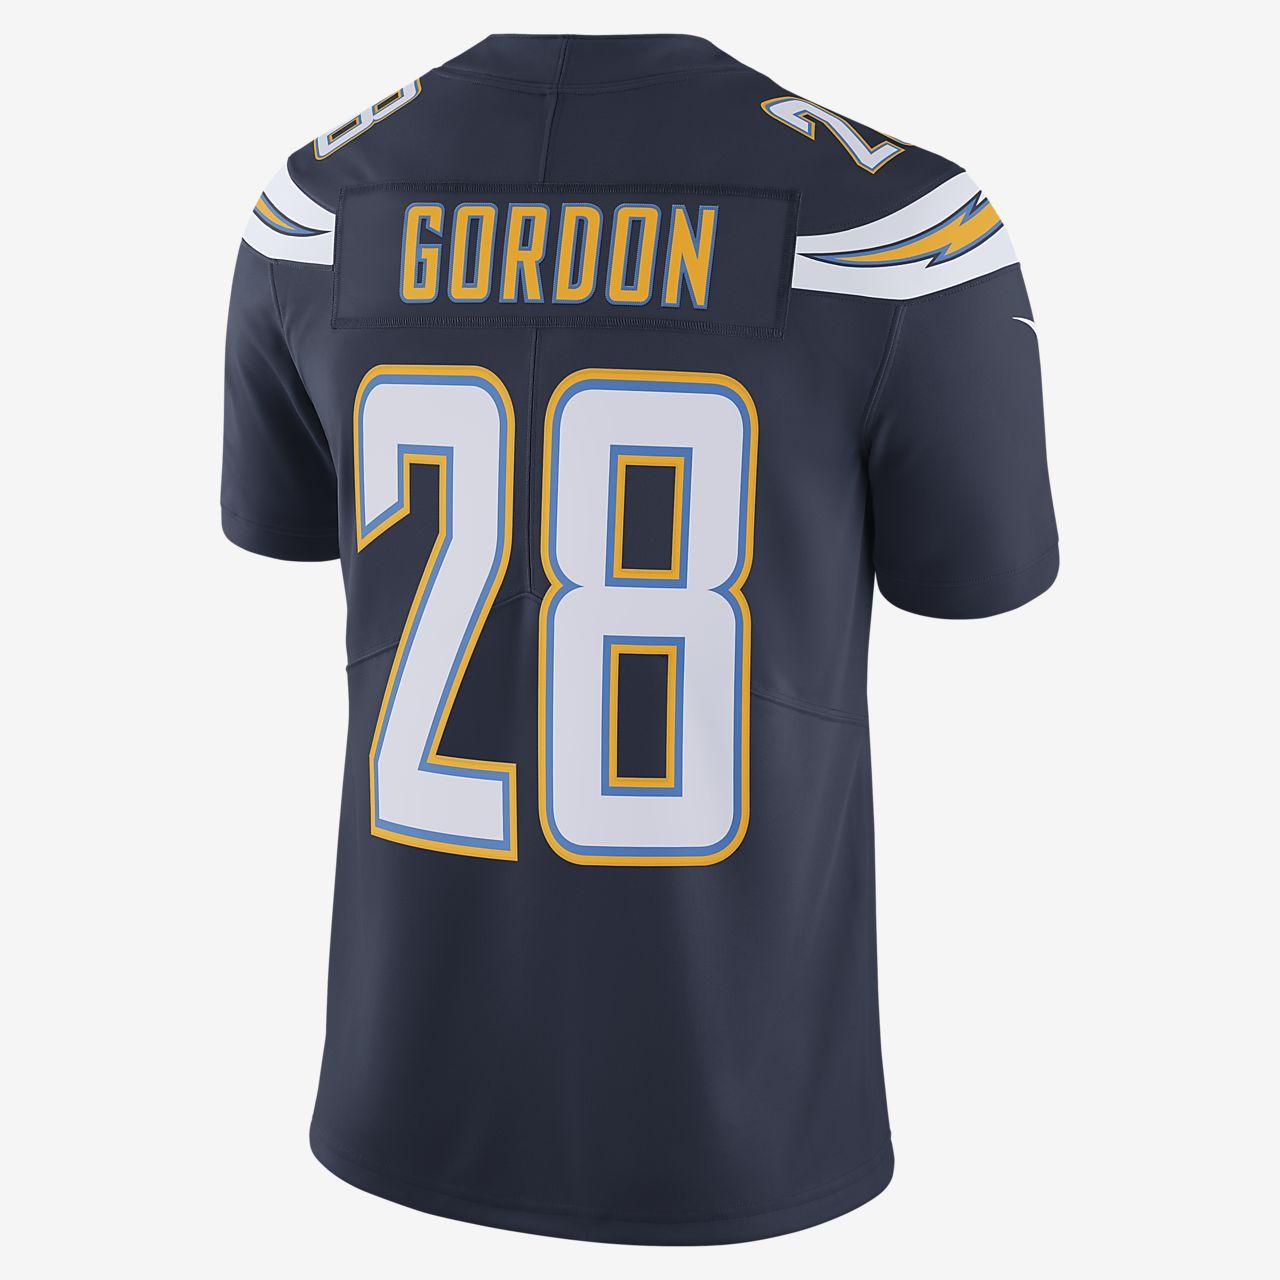 gordon jersey